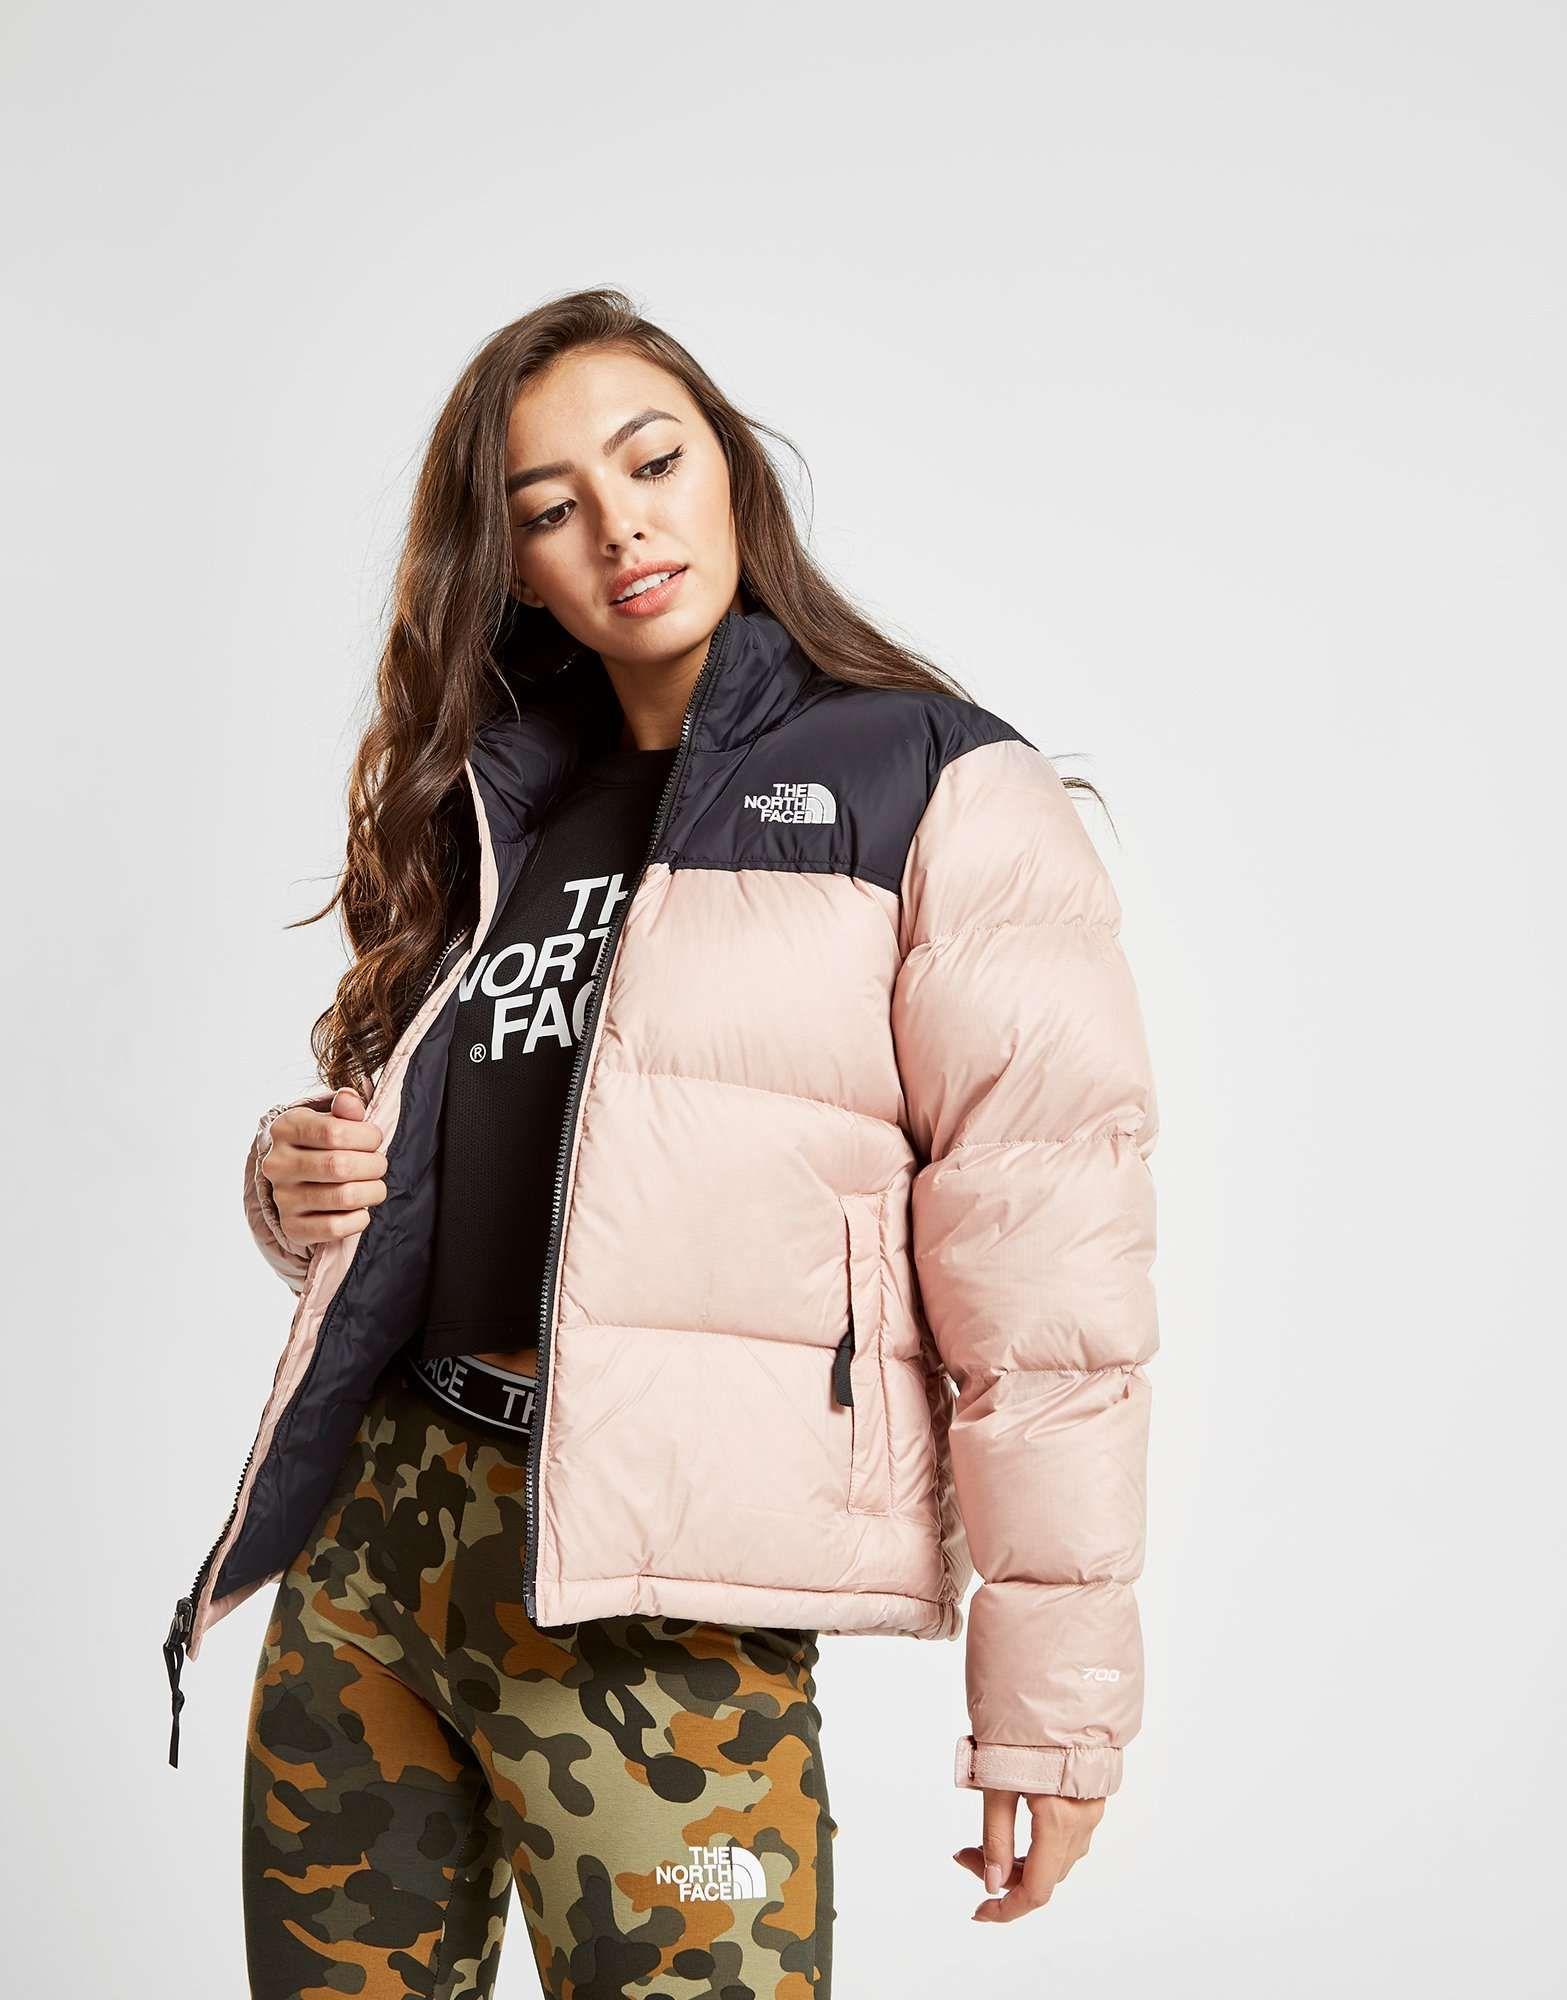 f5c603dd2 The North Face Nuptse 1996 Jacket | Fashion | 2018 | North face ...